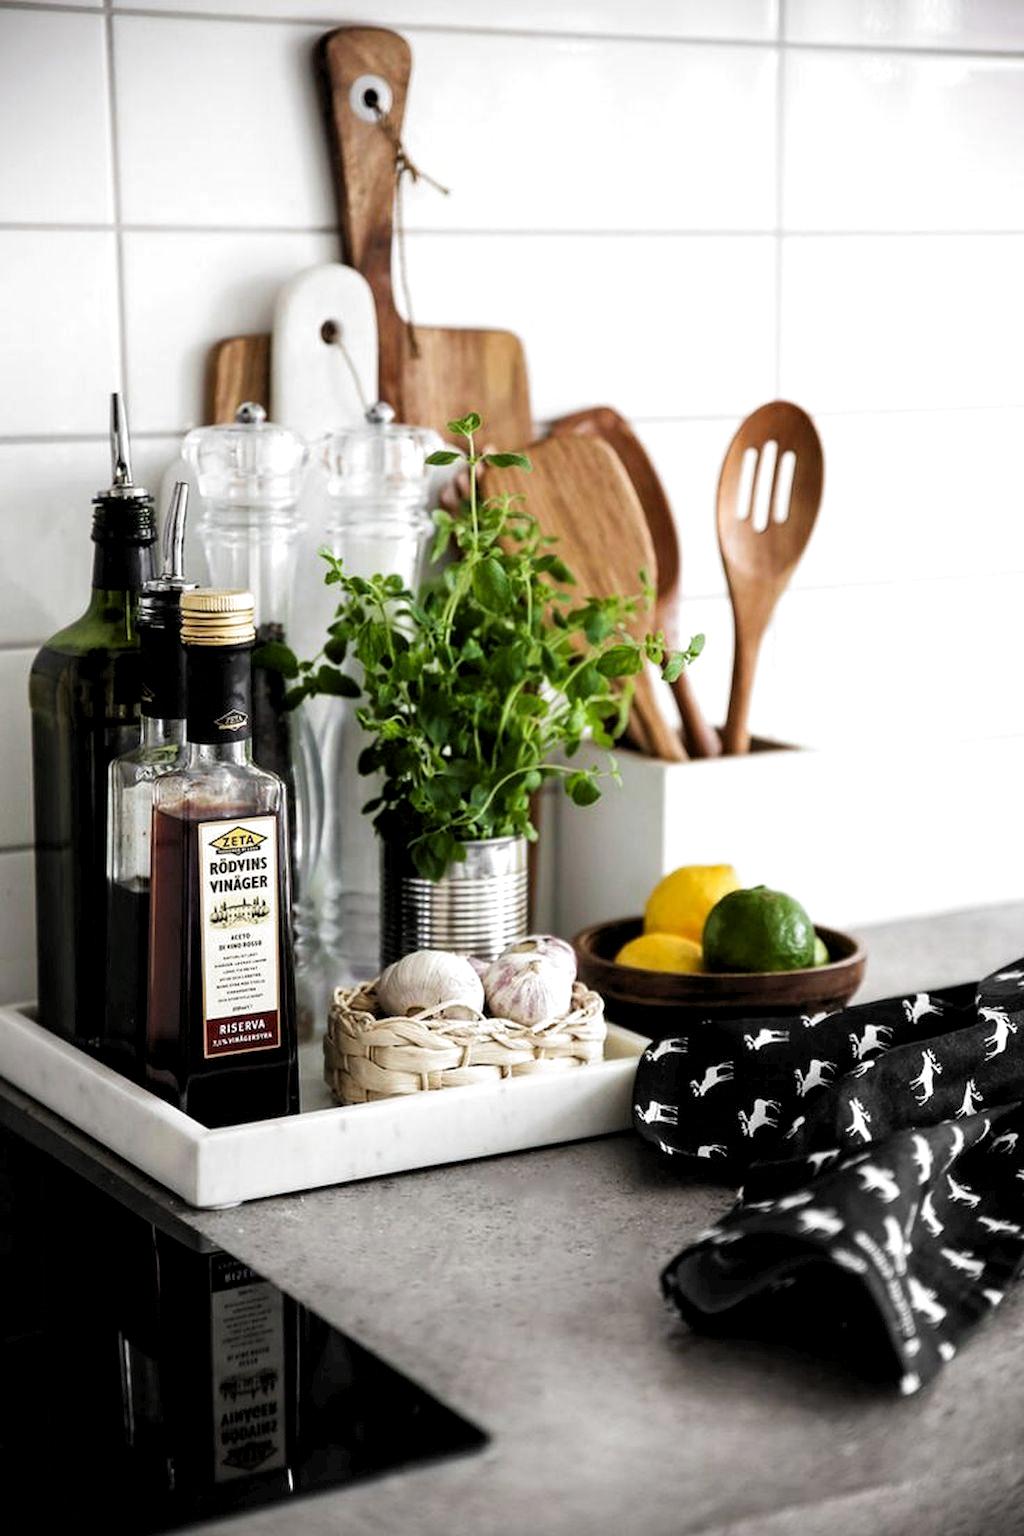 Fabulous Small Apartment Kitchen Decoration Ideas Samling Af Ting I Kokkenet Kitchen Counter Decor Kitchen Styling Kitchen Remodel Small